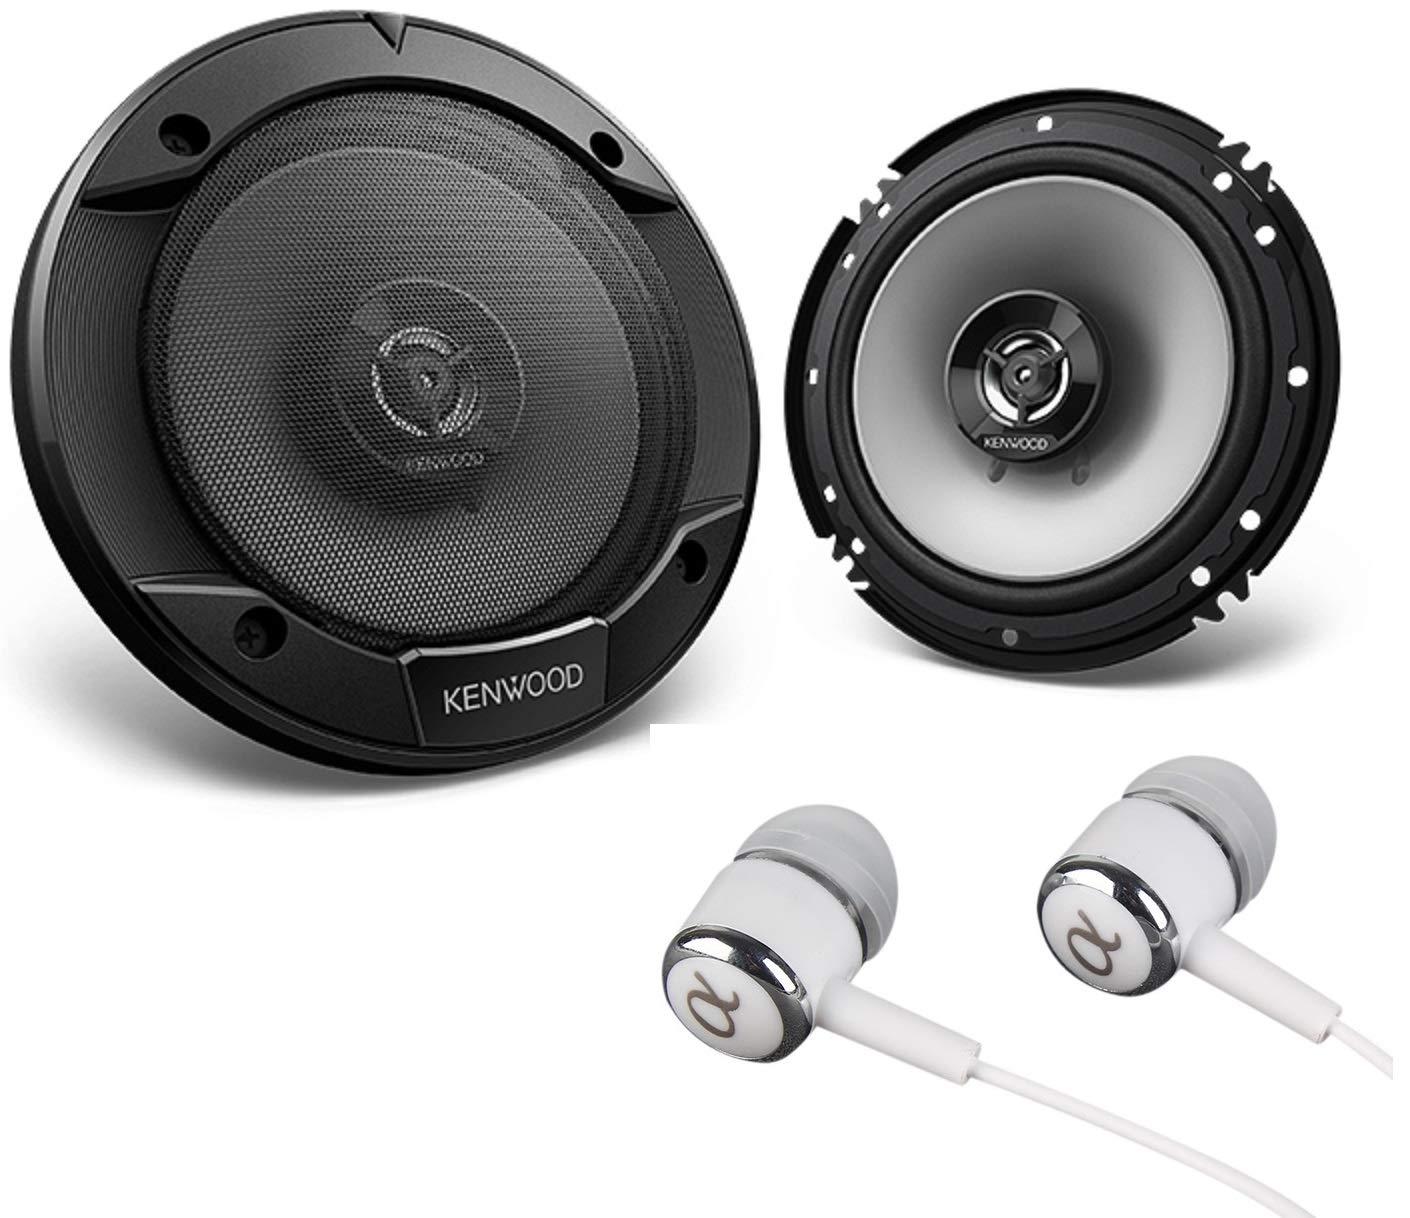 Kenwood KFC-1666S 6-1//2 600W Max FREE ALPHASONIK EARBUDS 6.5 KFC 2-Way Sport Series Flush Mount Car Audio Door Coaxial Speakers 60W RMS